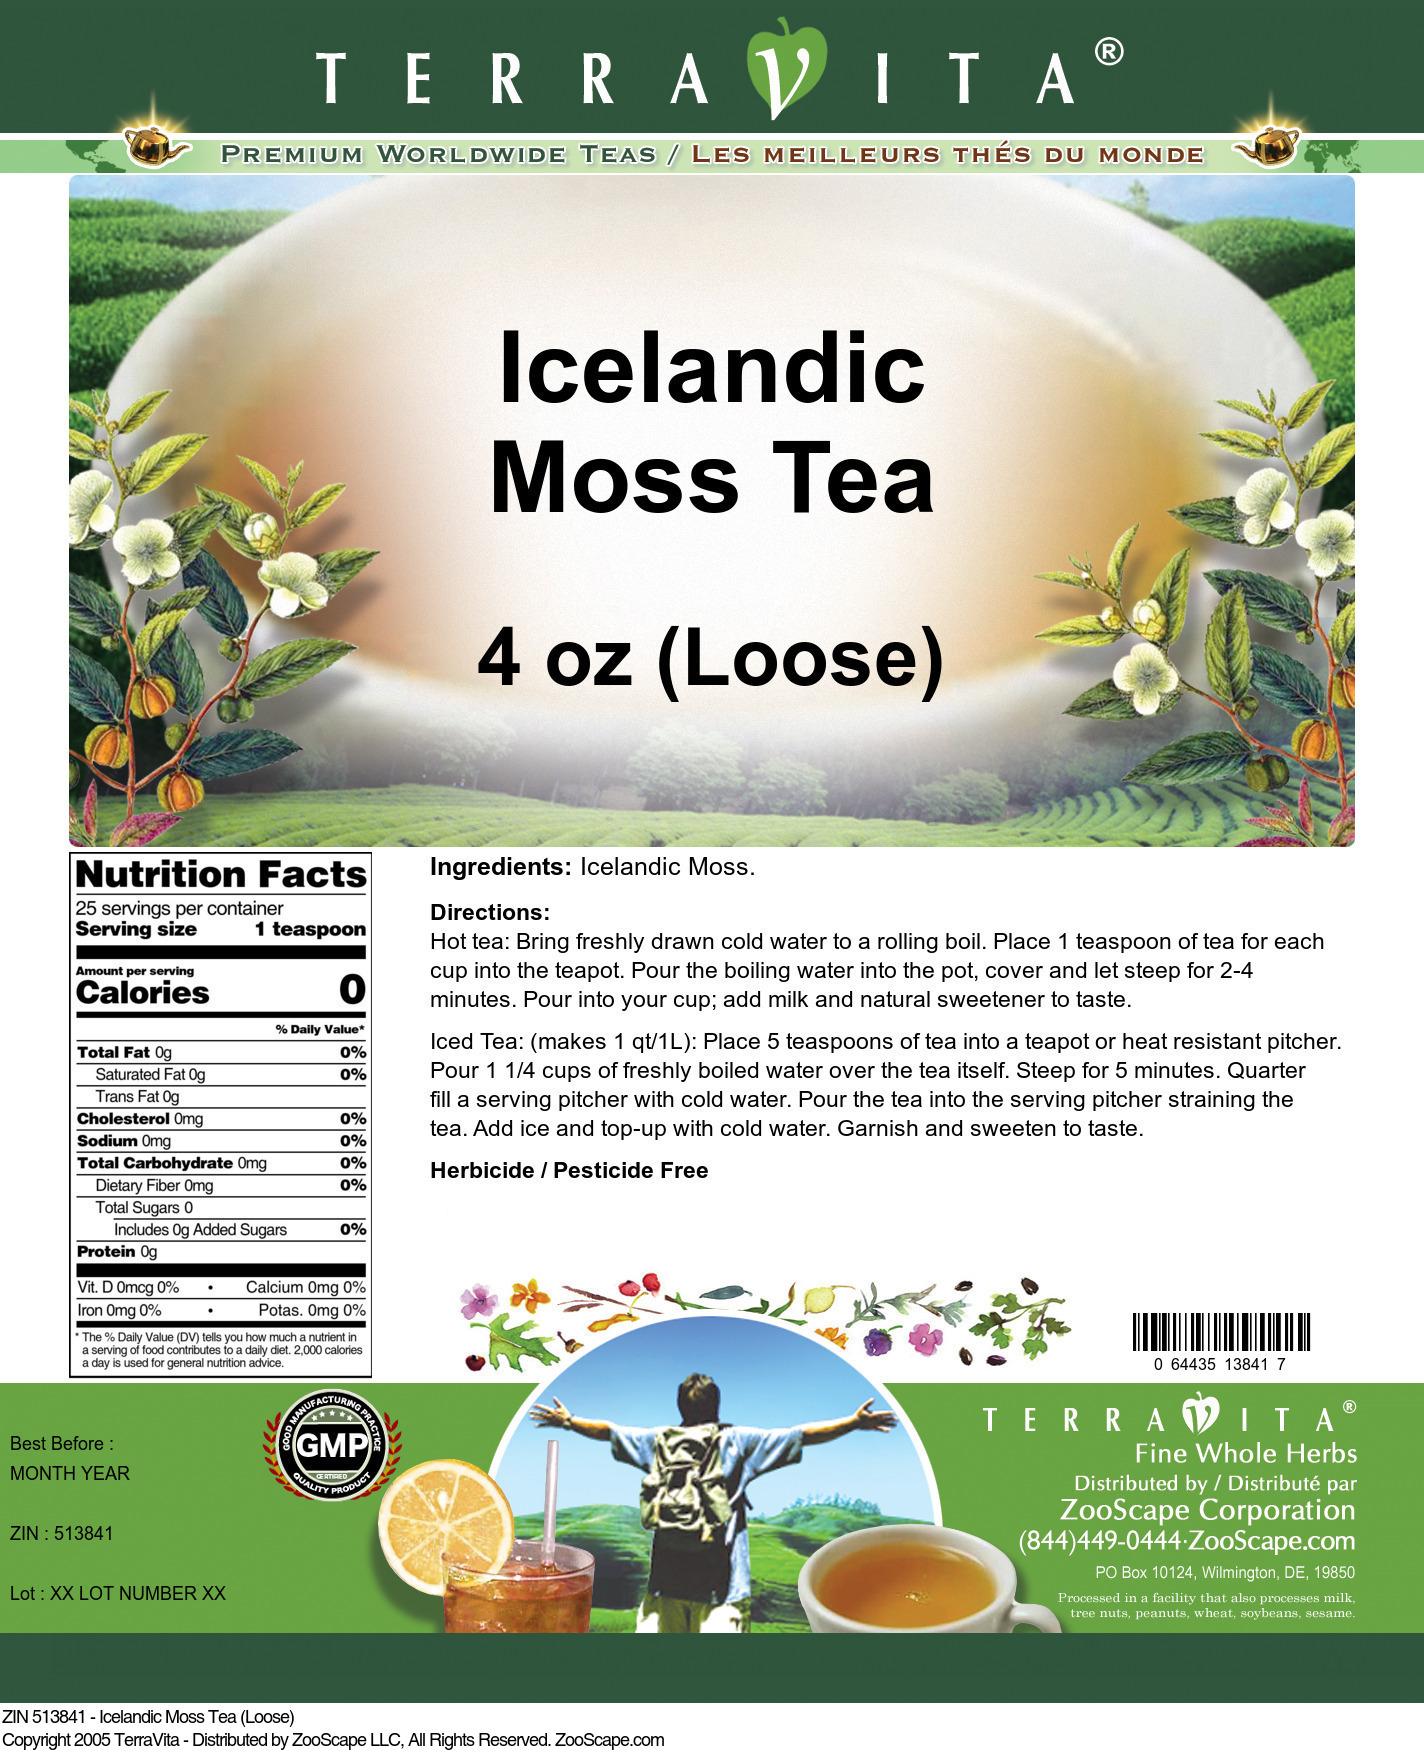 Icelandic Moss Tea (Loose)